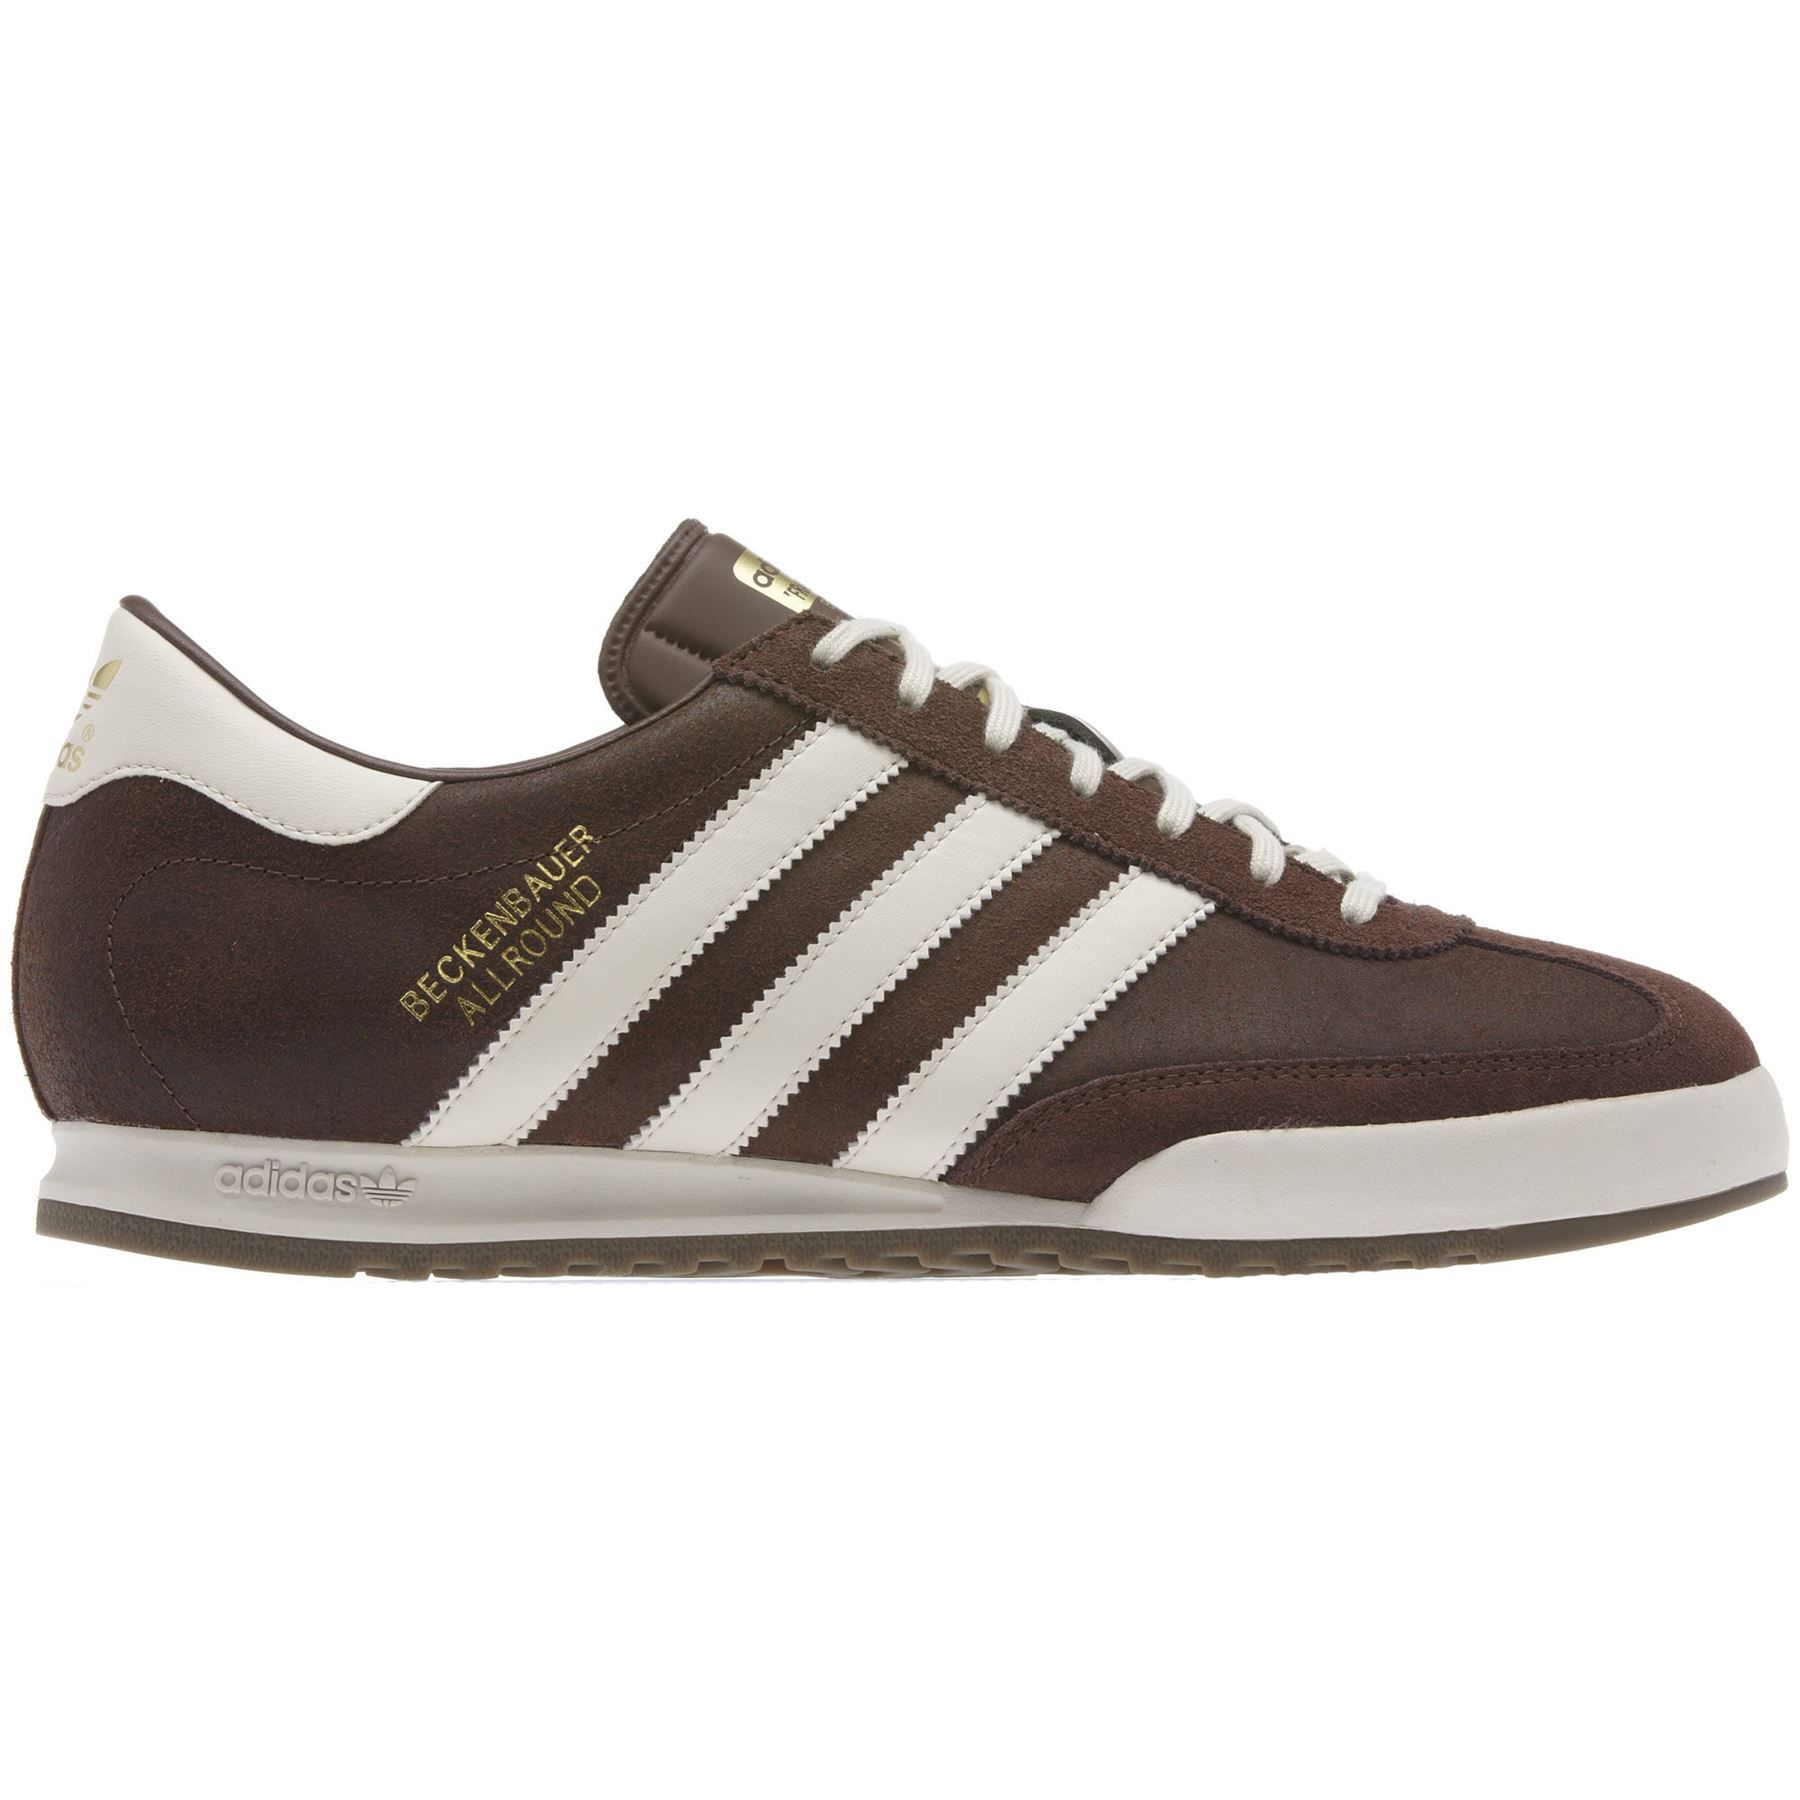 adidas original trainers